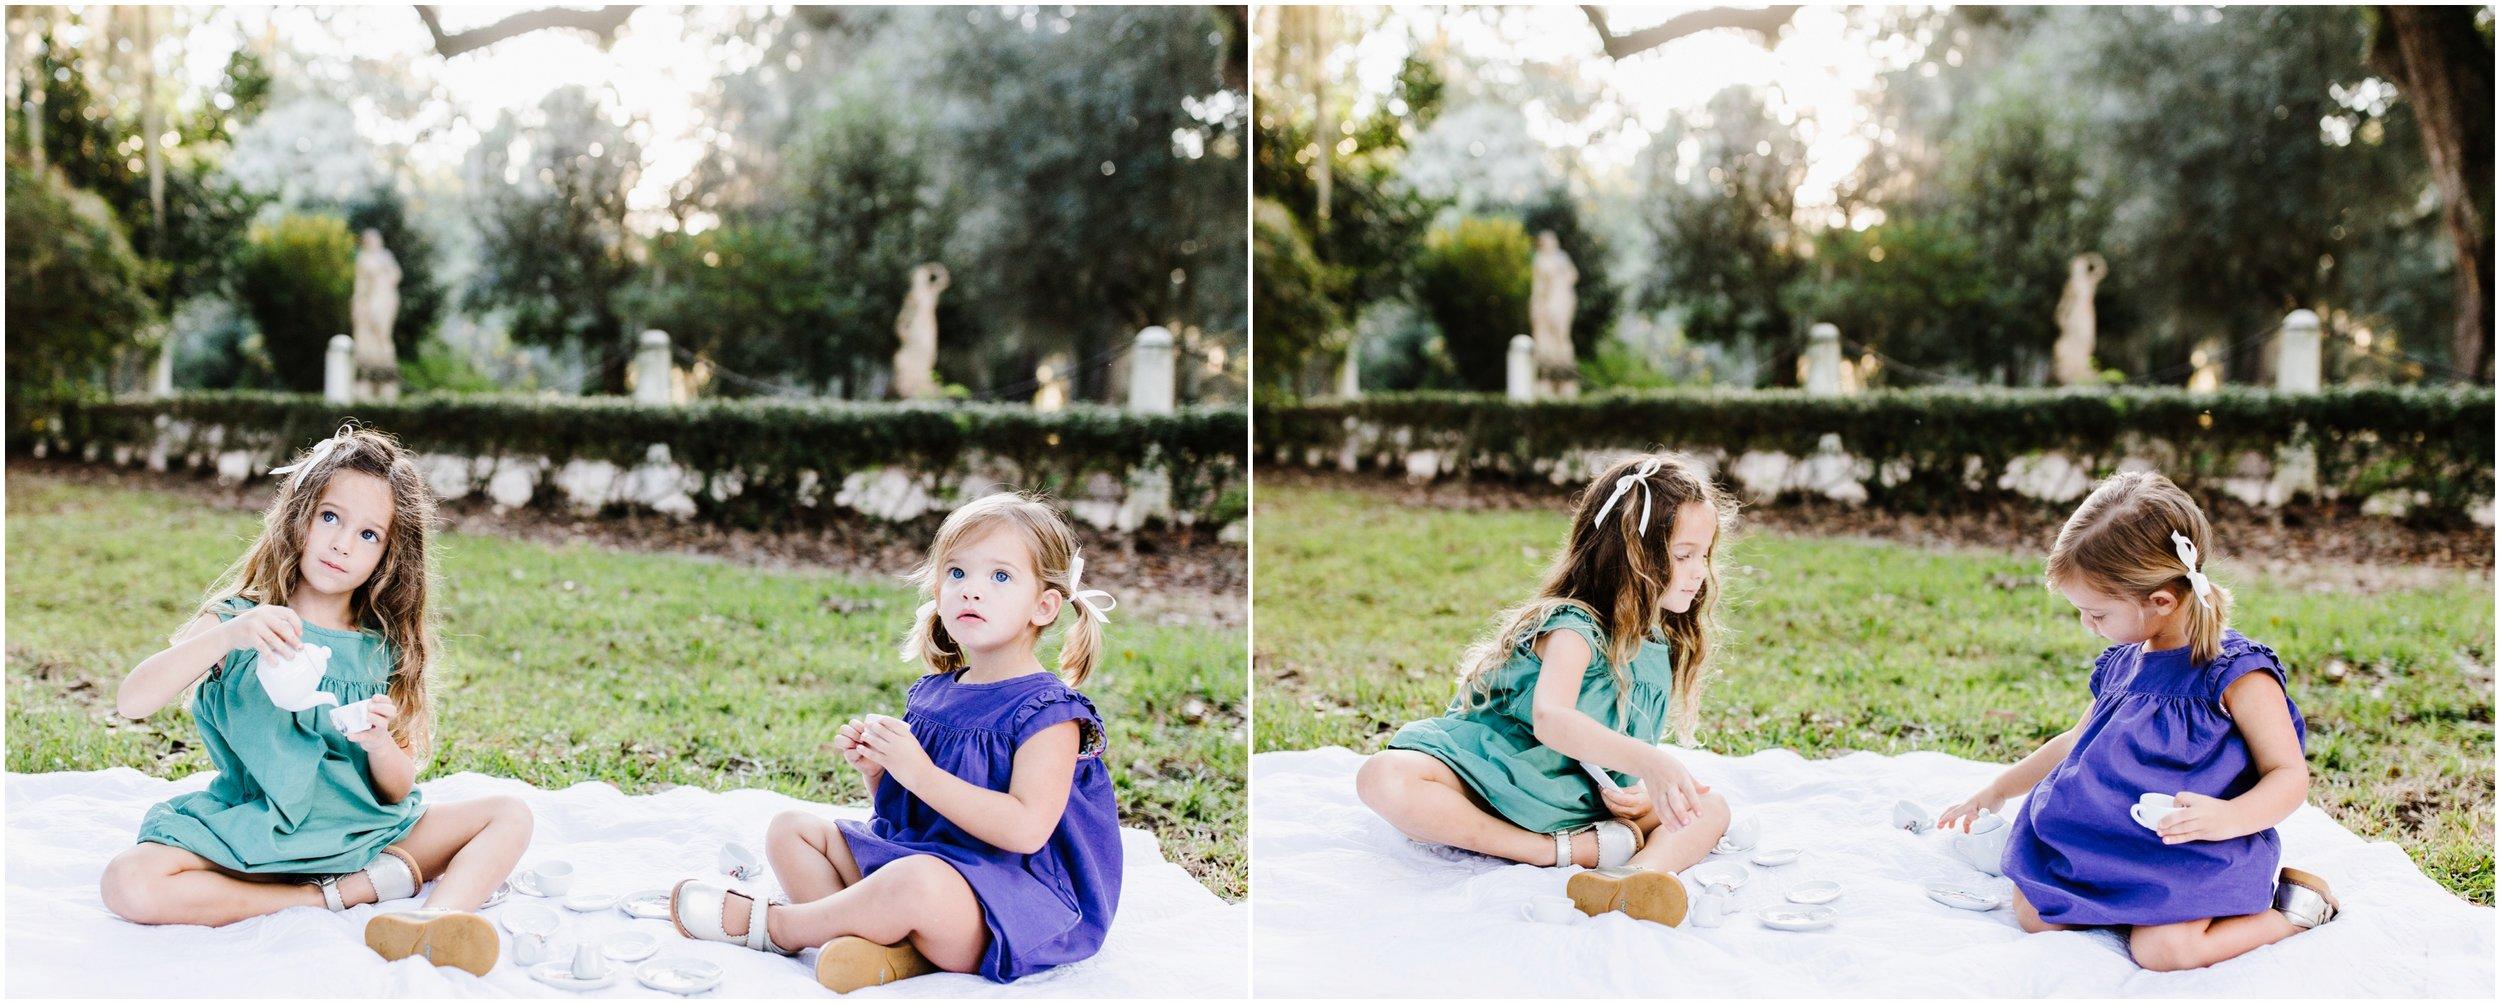 Hebert-2017-November-Family-Session-9721_quaint-and-whim-lifestyle-photographer-louisiana-.jpg